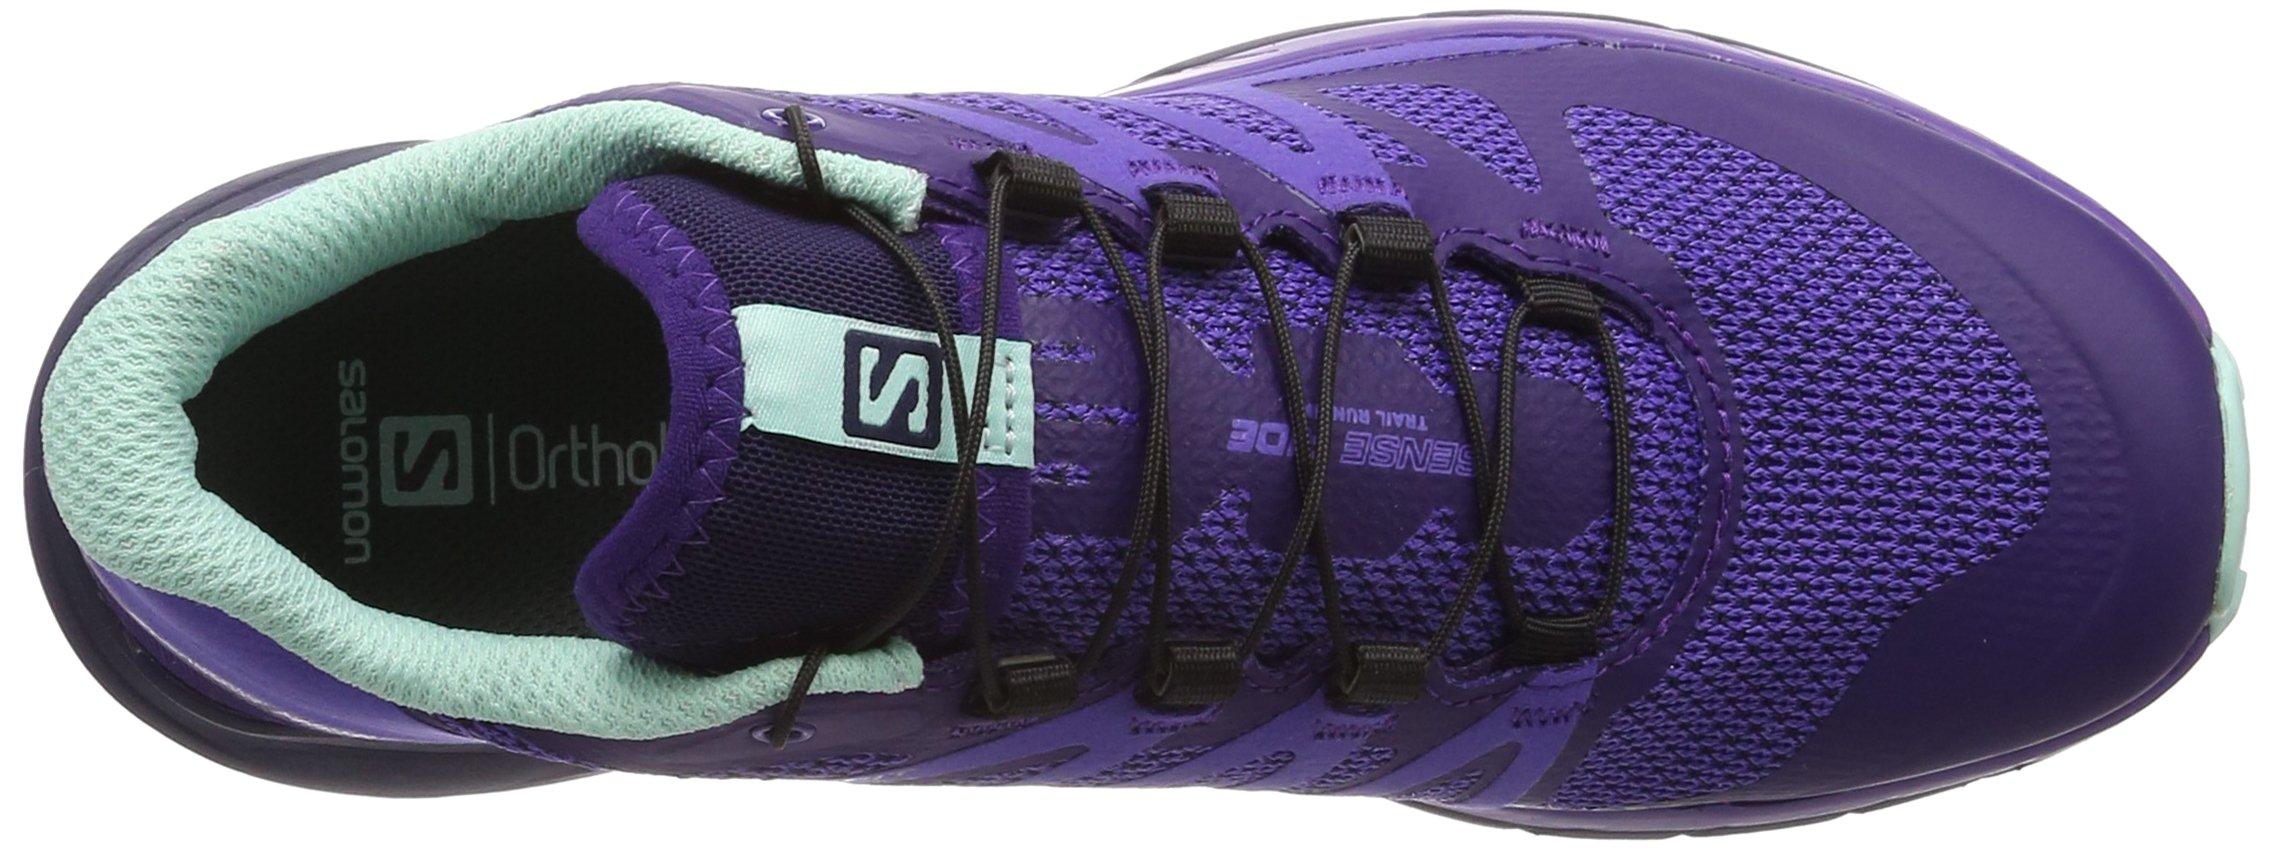 Salomon Women's Sense Ride Running Shoes, Purple, 6.5 M by Salomon (Image #7)